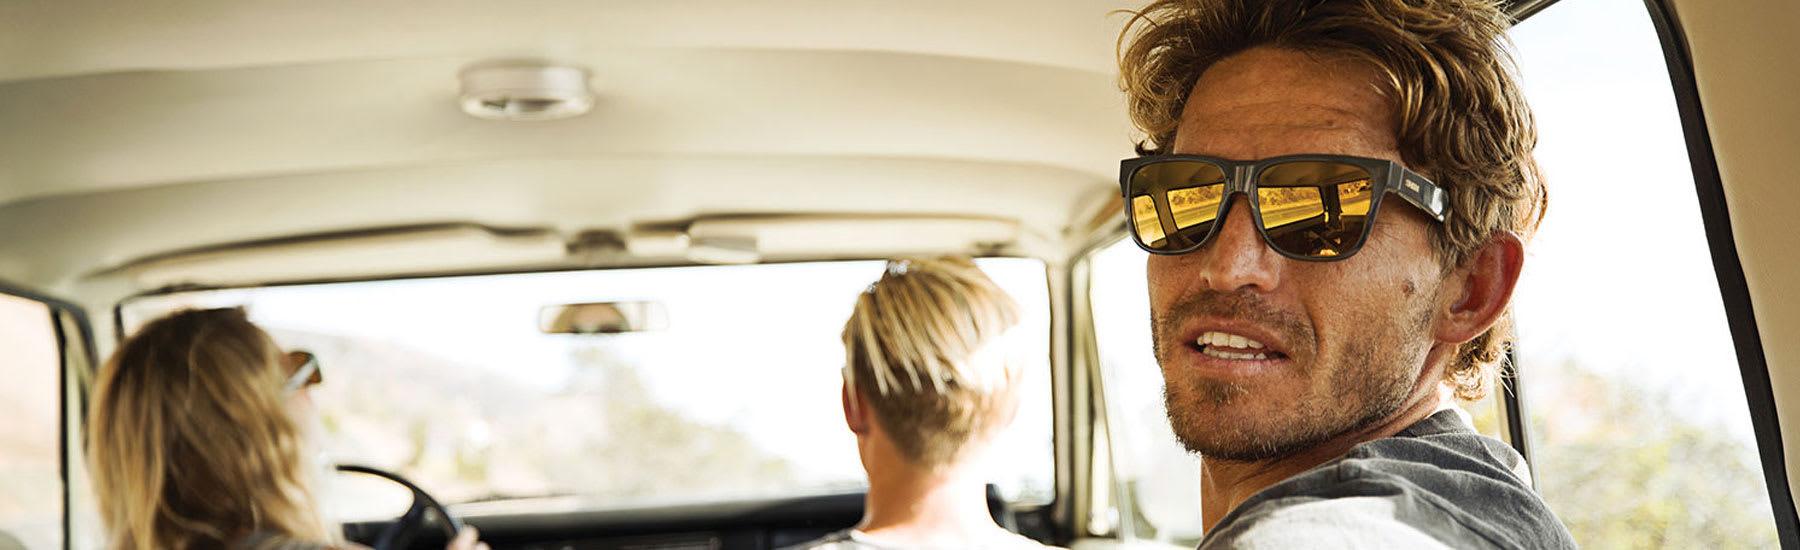 Smith Snowboard Goggles, Ski Goggles, Sunglasses, Helmets